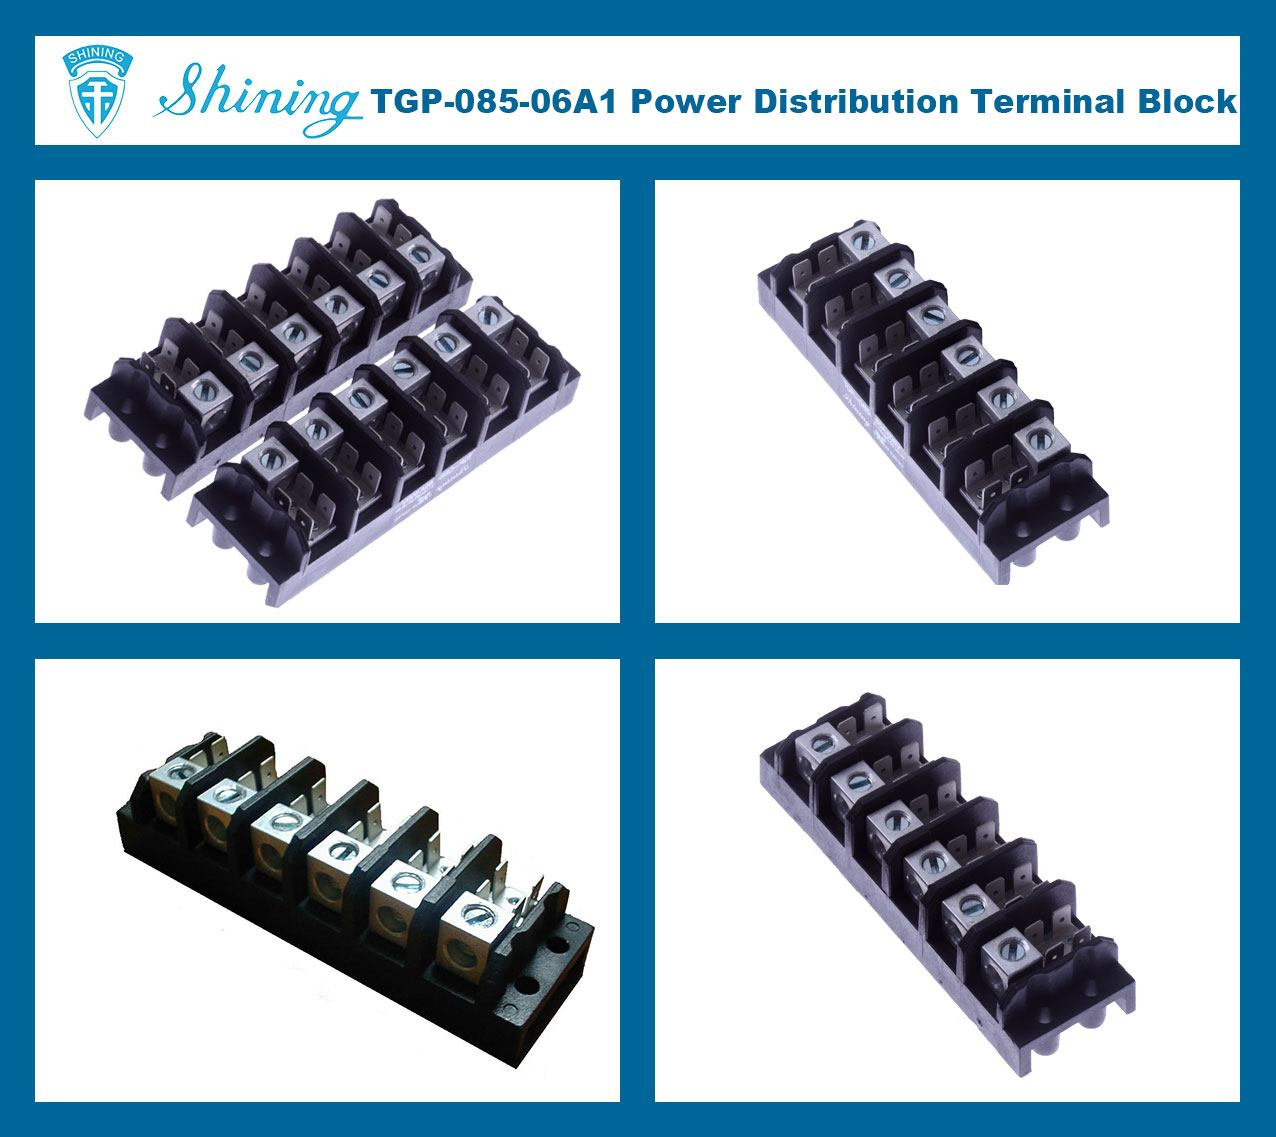 TGP-085-06A1 600V 85A 6 Pole Electrical Power Terminal Block